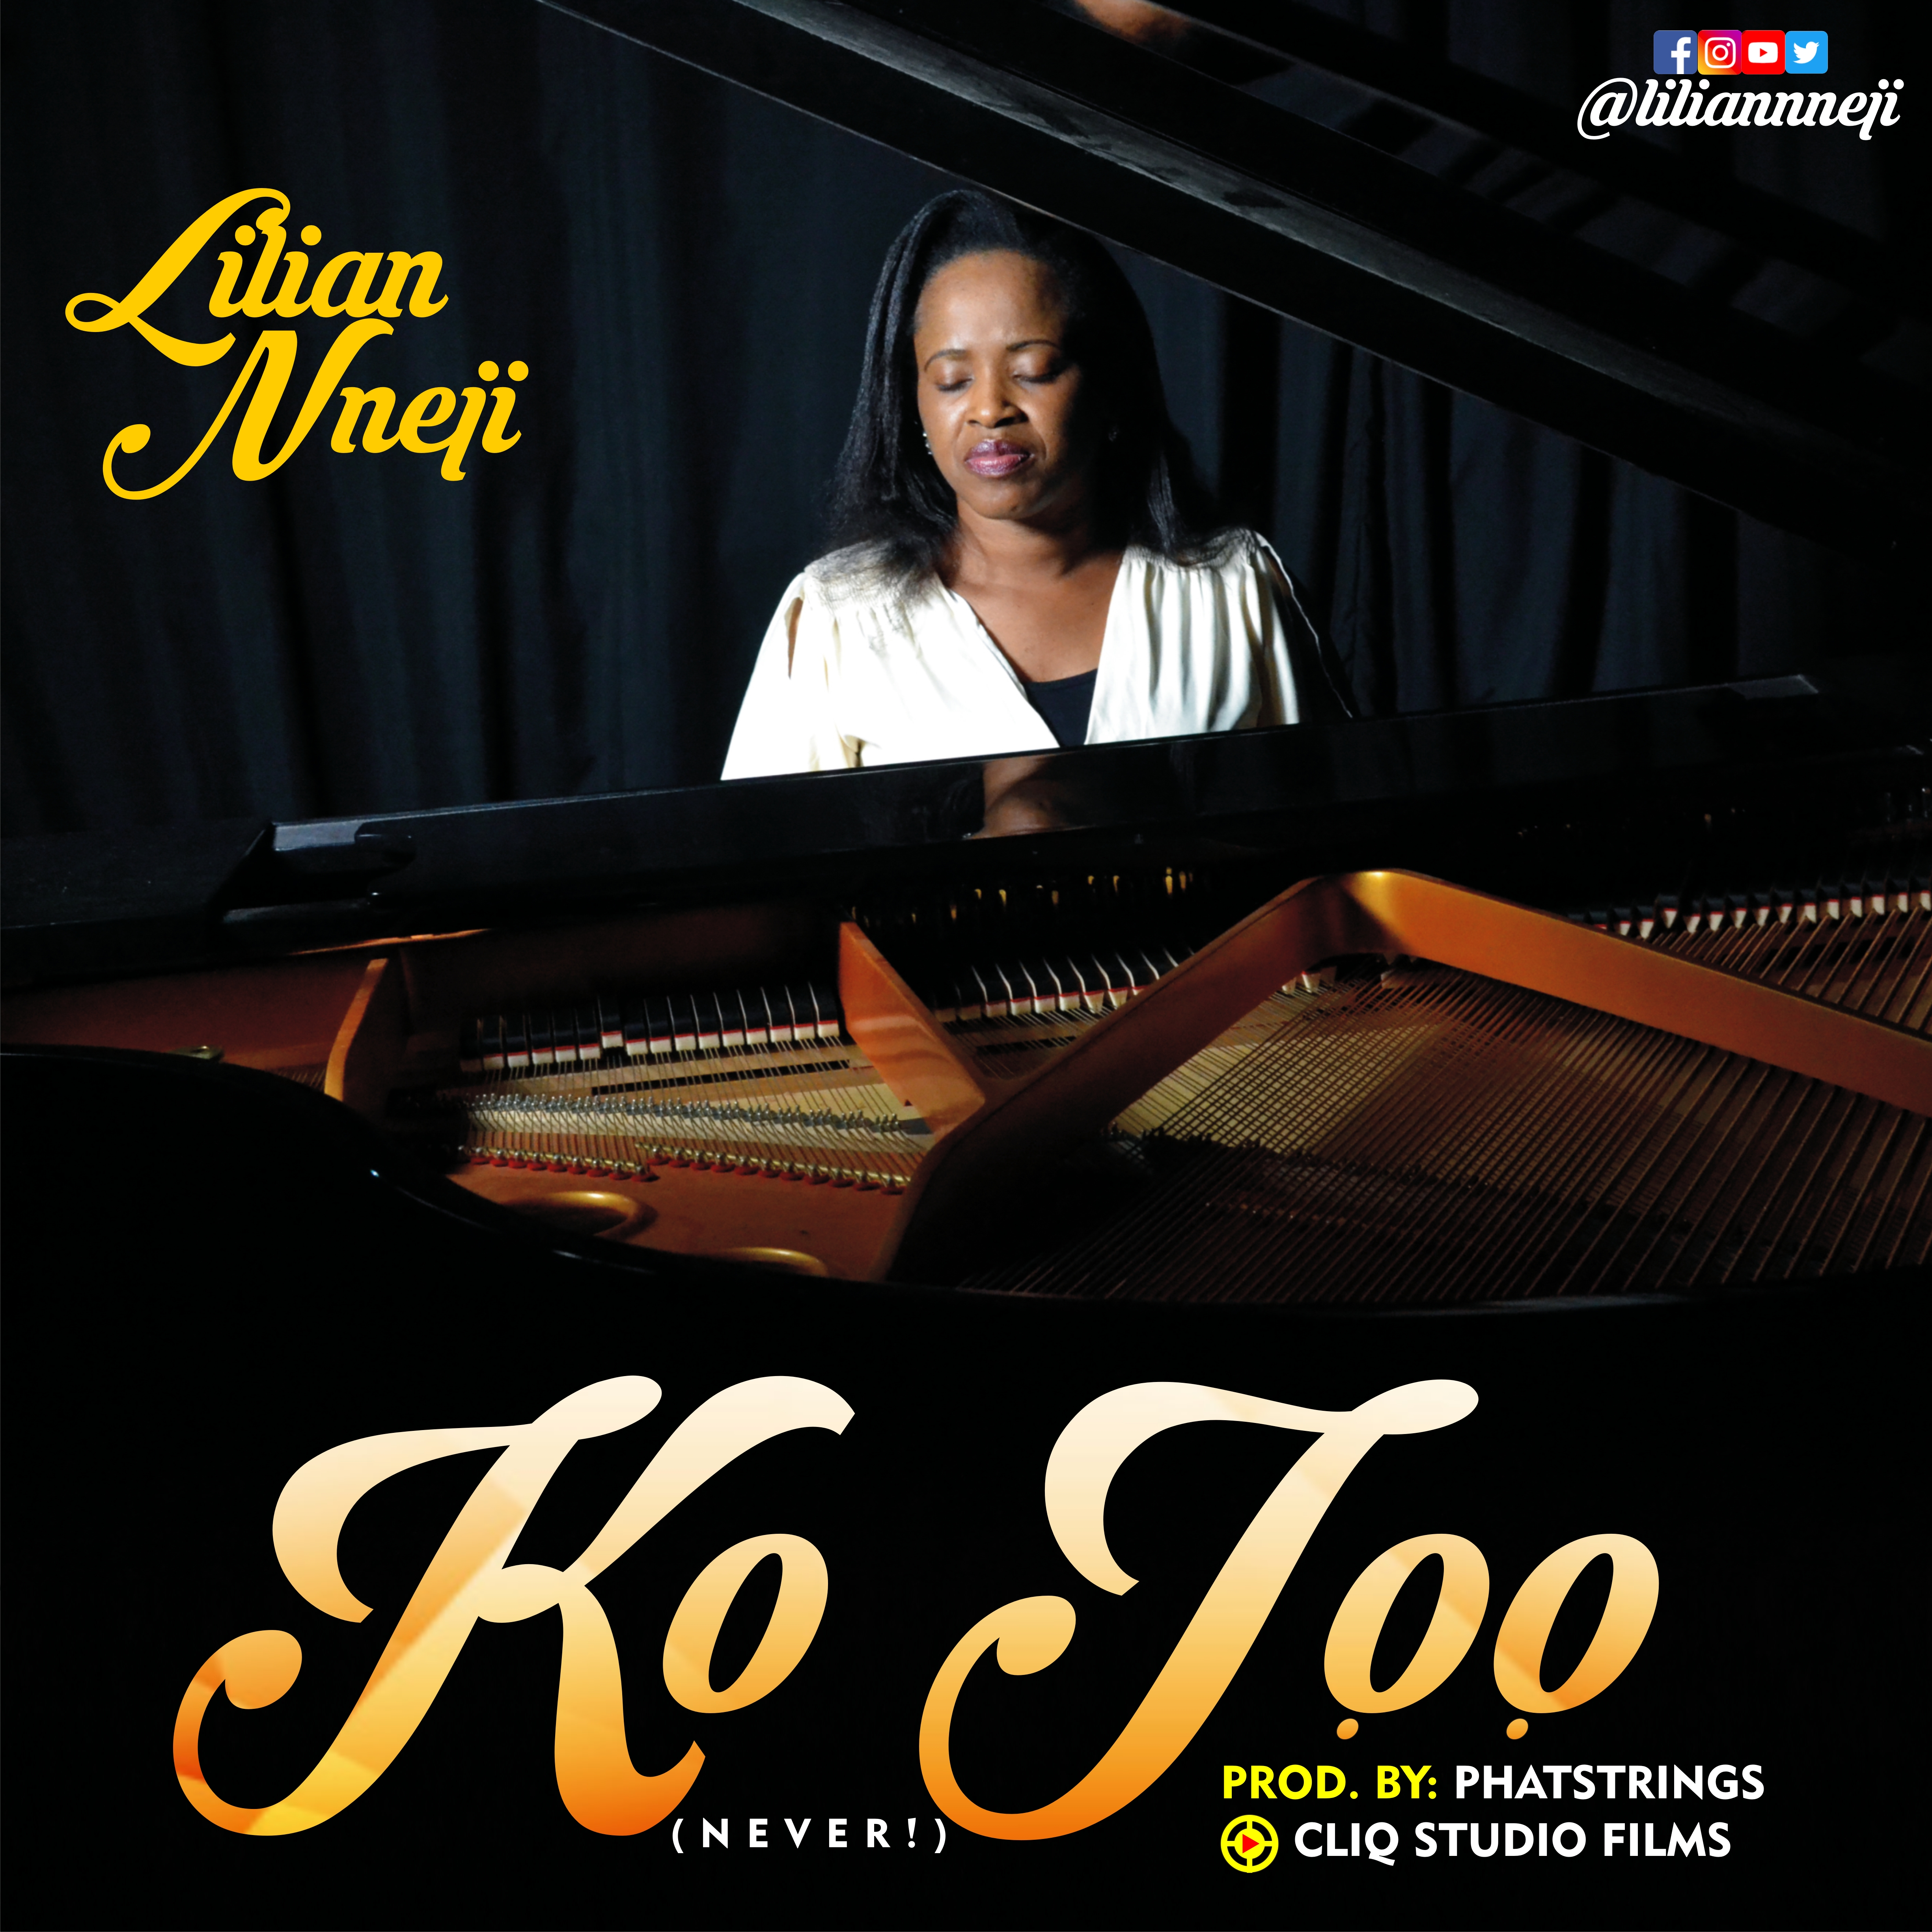 Lilian Nneji Ko Joo